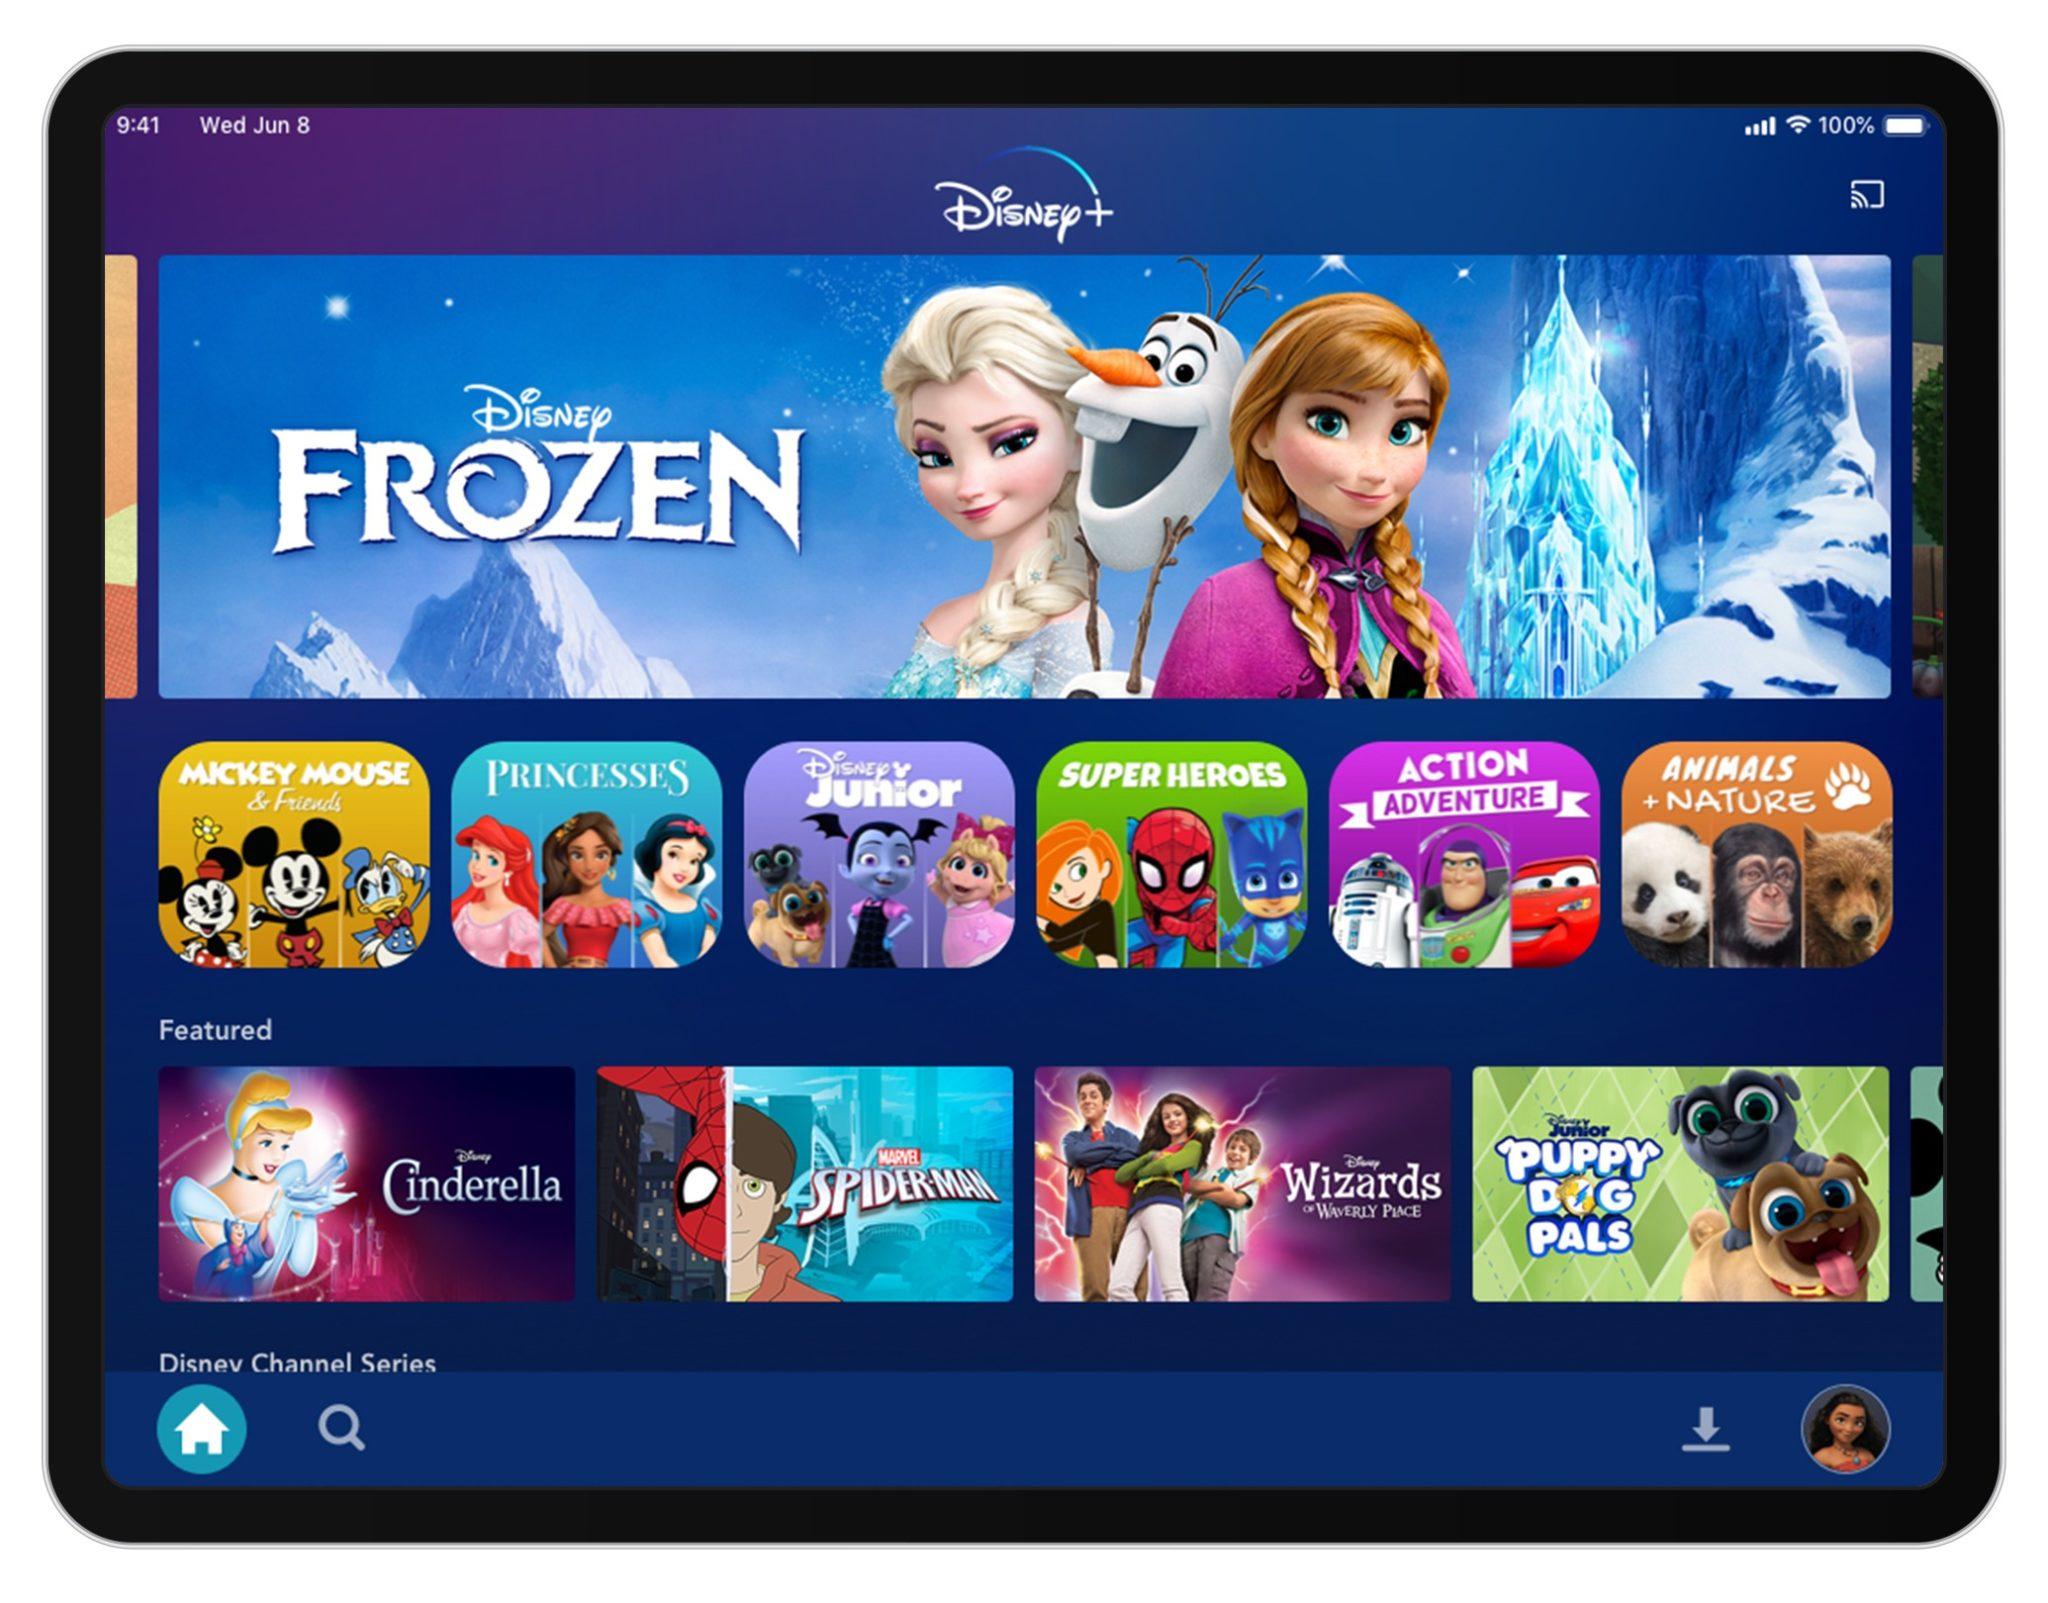 Disney+ Kids profile landing screen